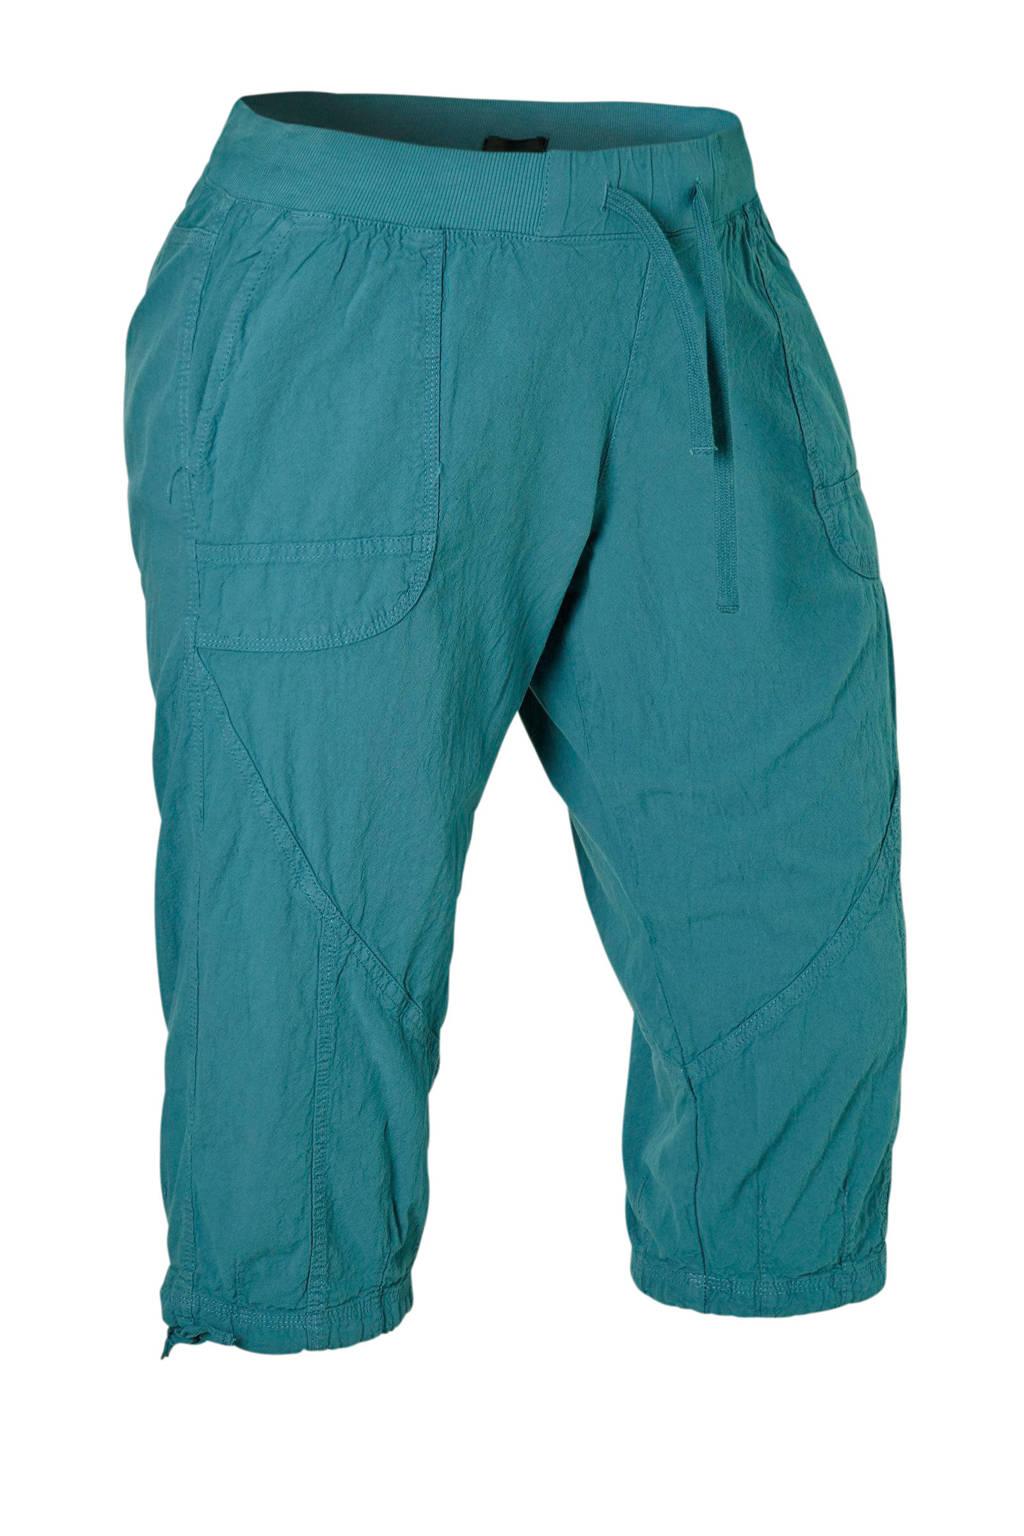 Zizzi loose fit capri turquoise, Turquoise